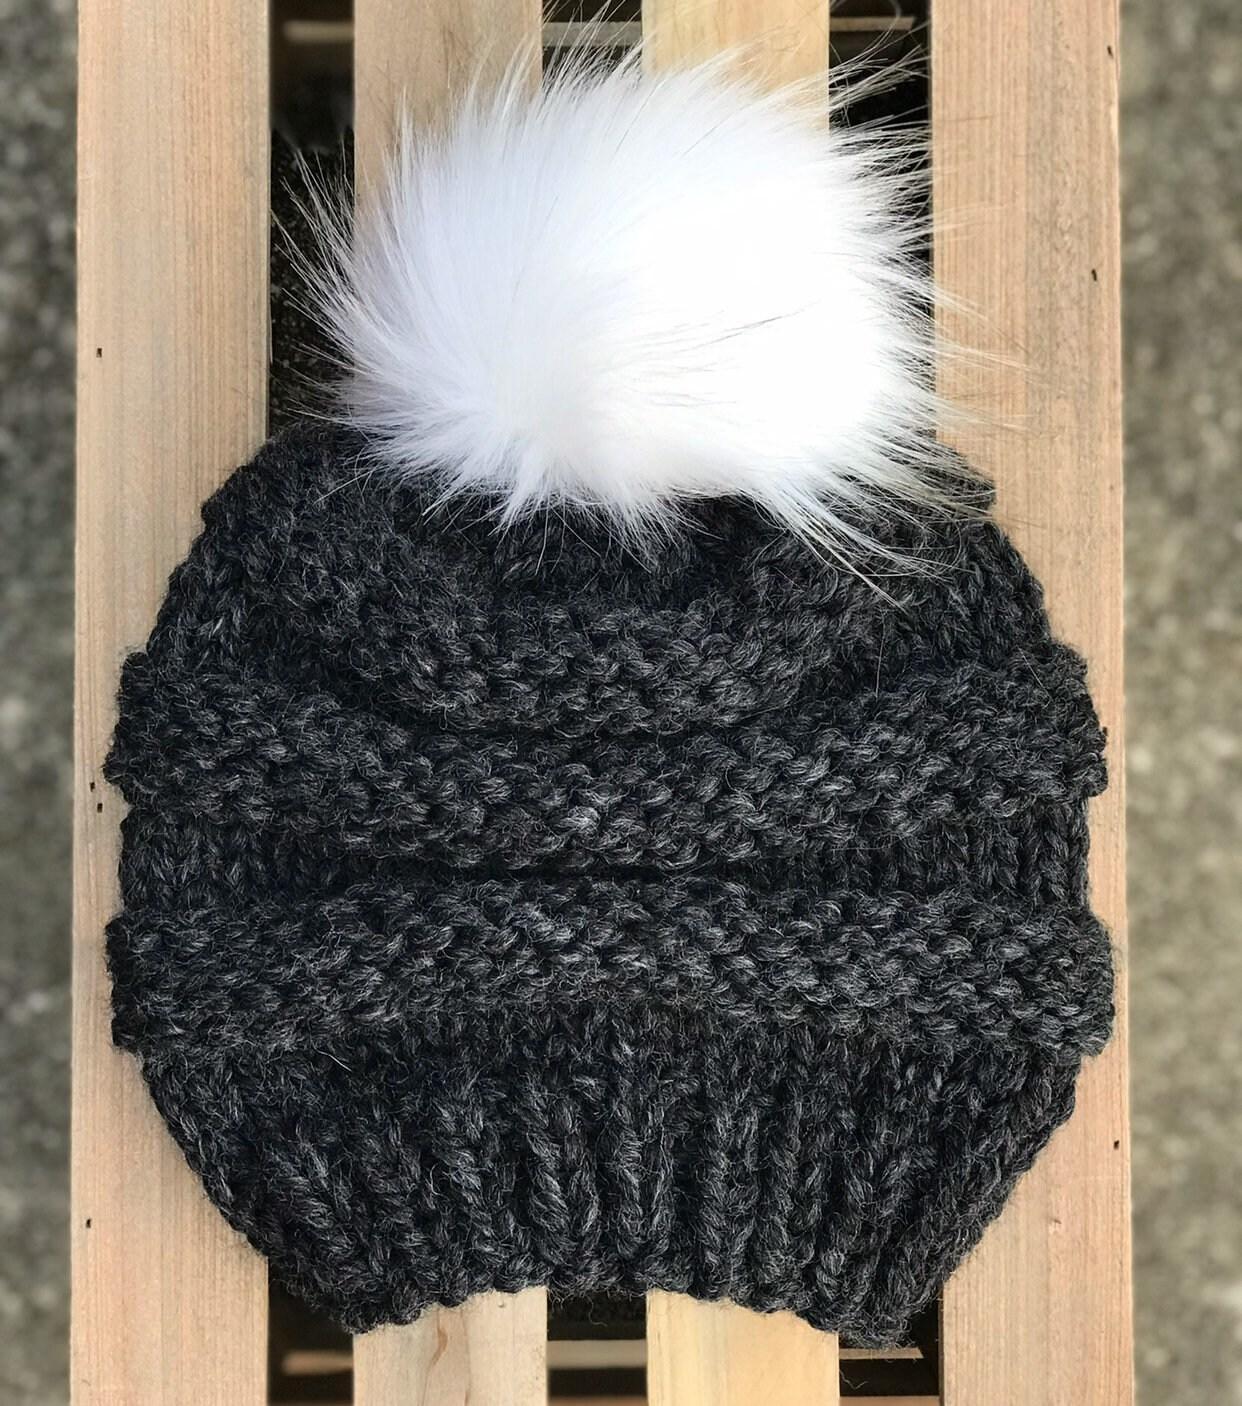 dress - Pom pom beanies knitted for fall-winter video